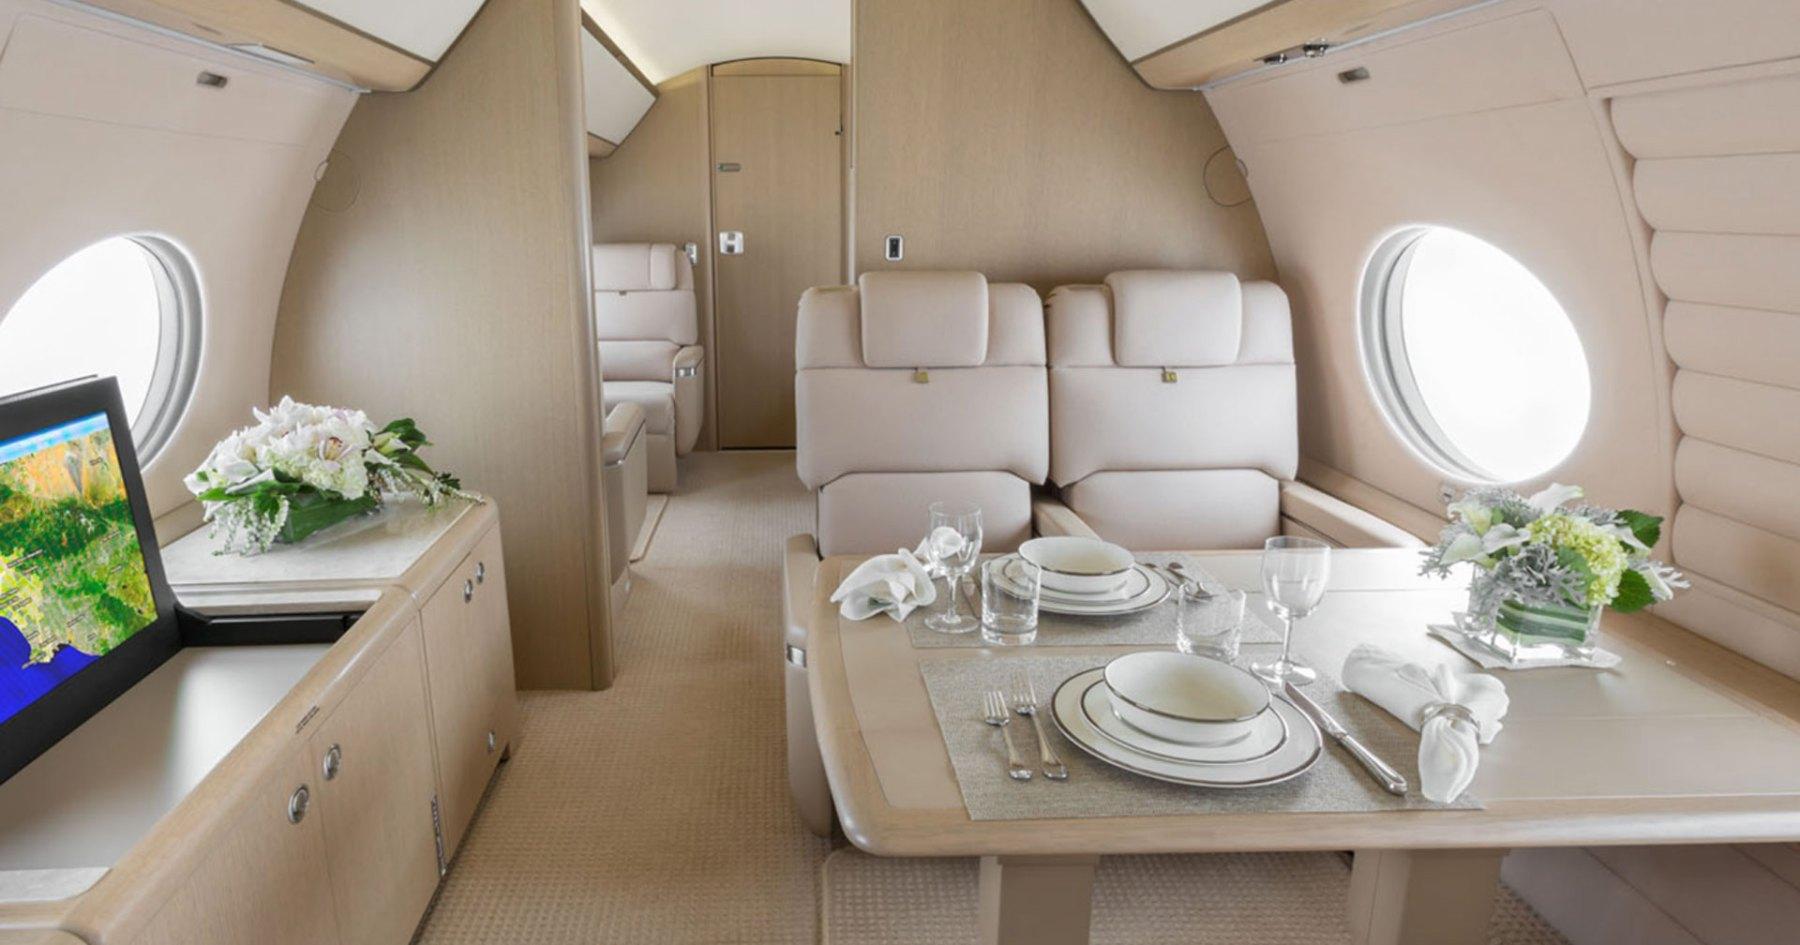 Private Jet and Box Seat Club Seeks Members